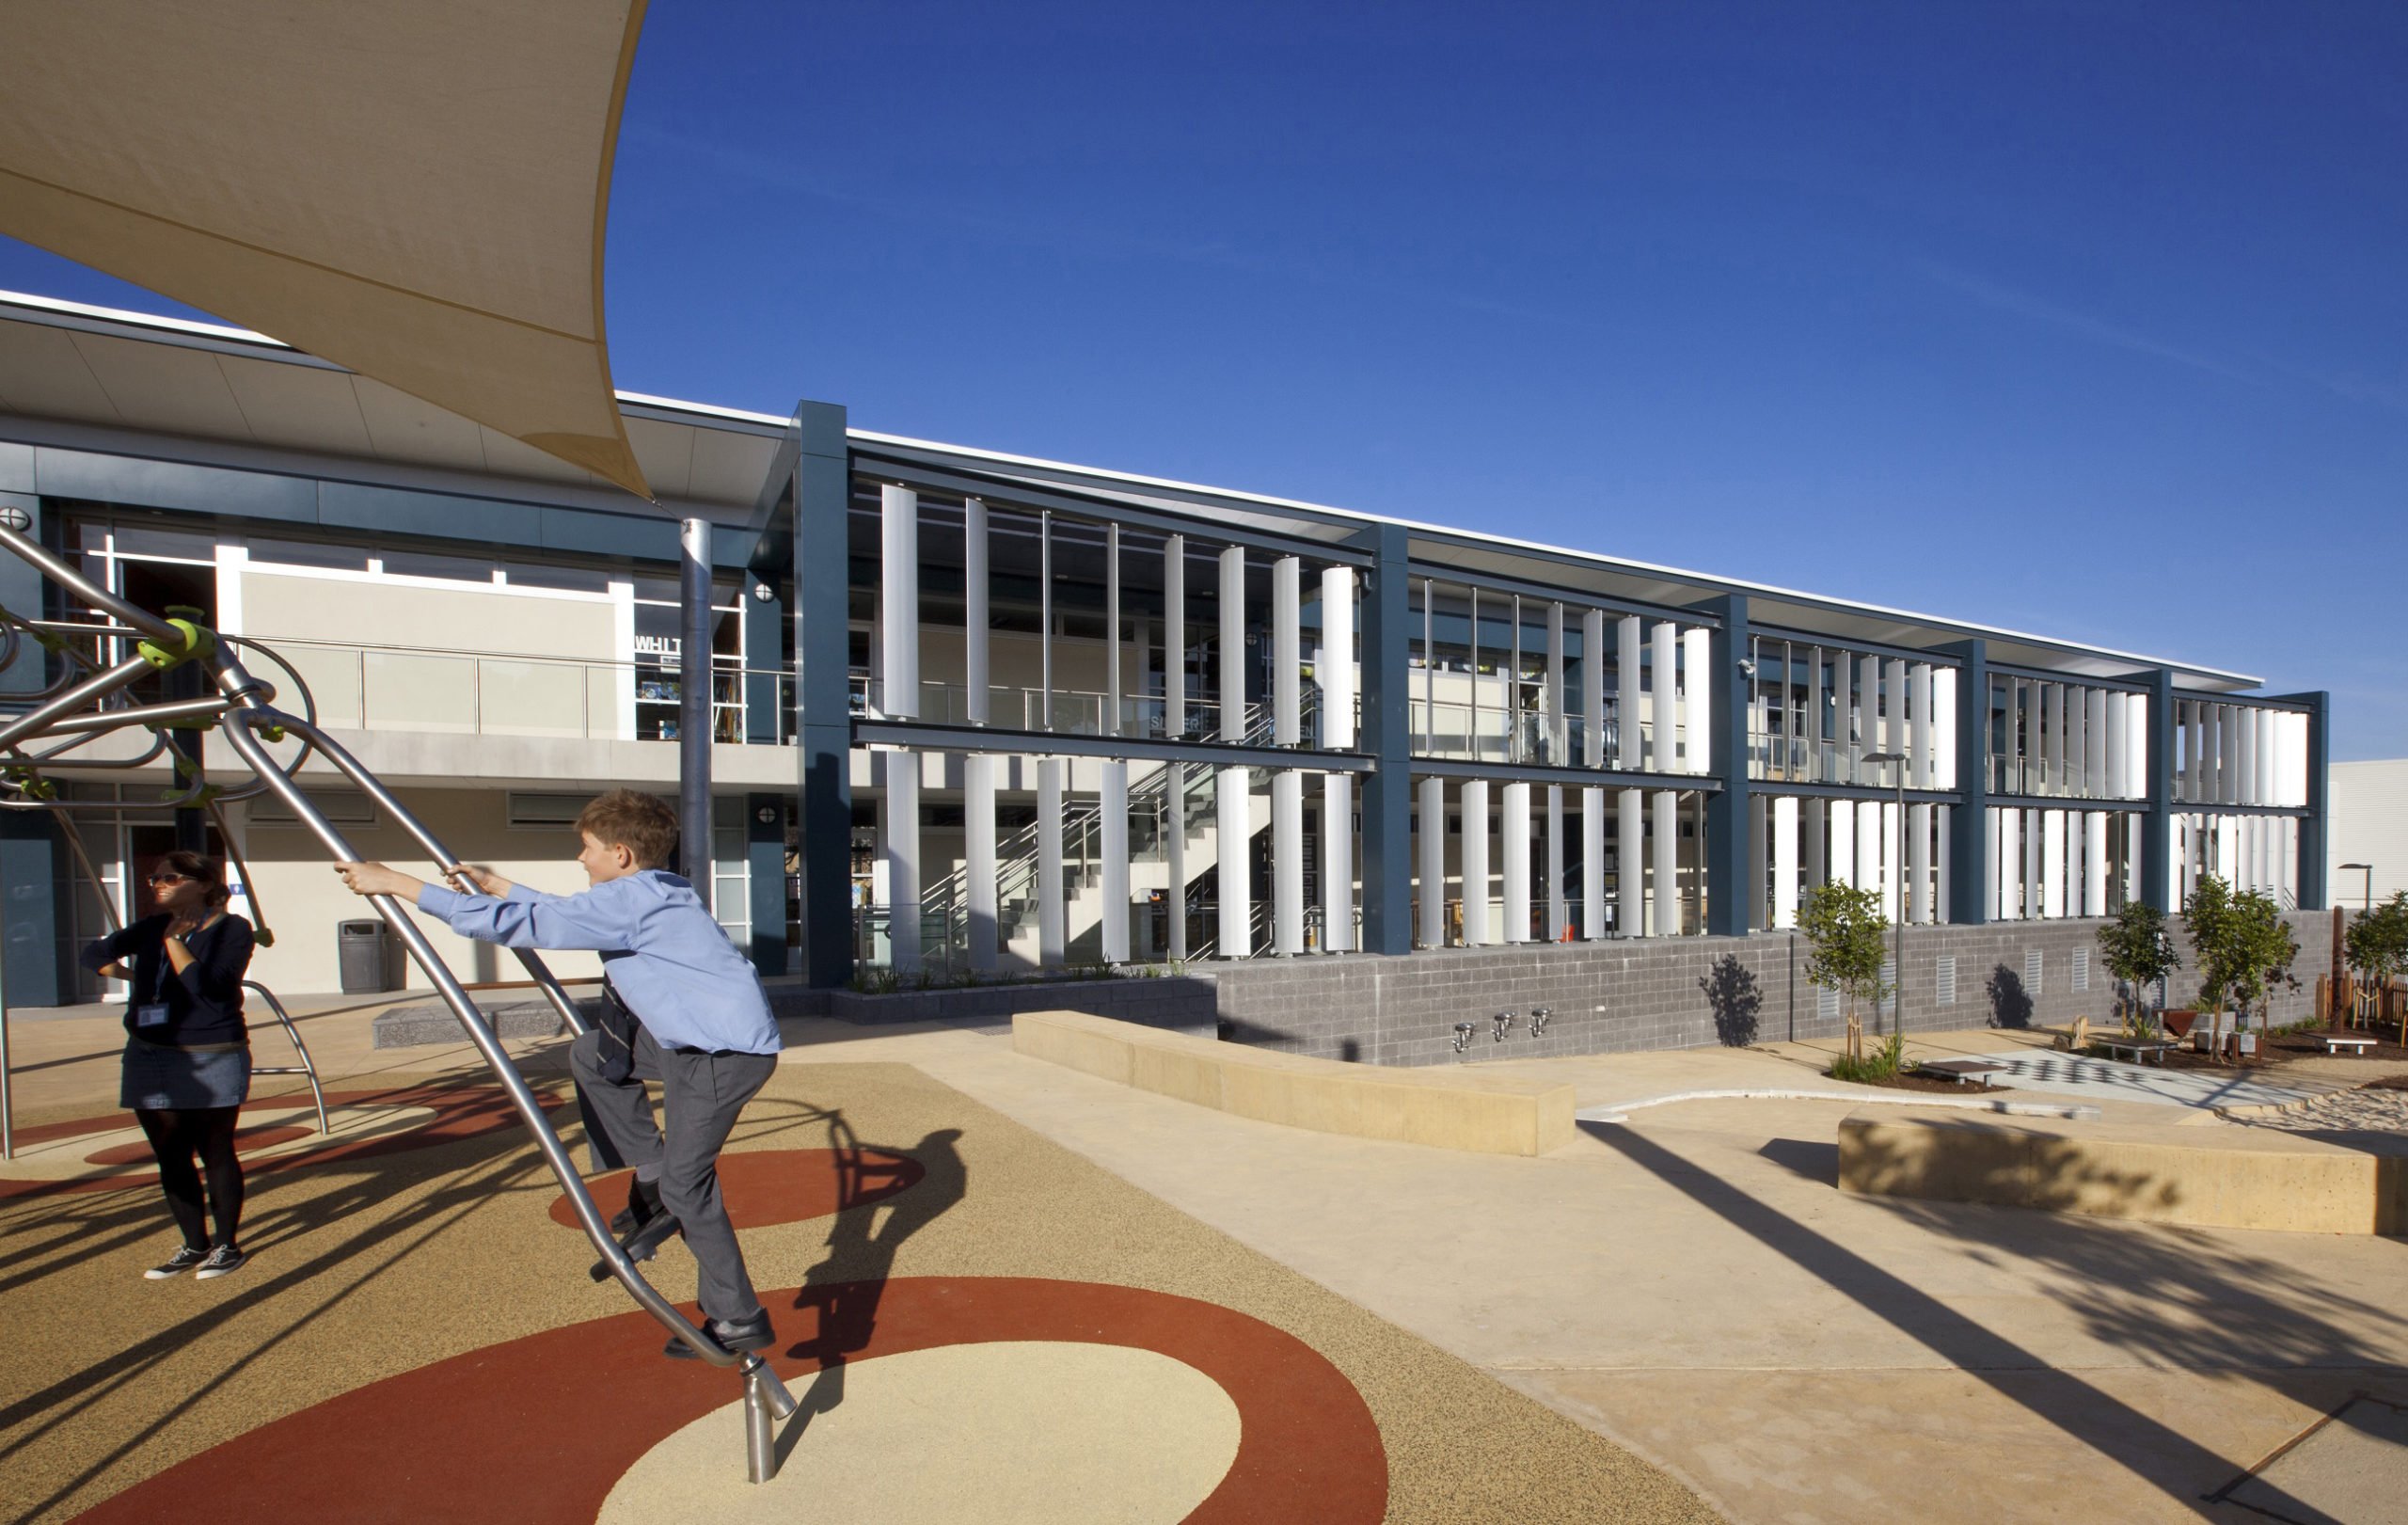 Redlands Preparatory School Exterior Architecture and Child Playing – Gardner Wetherill GW 1